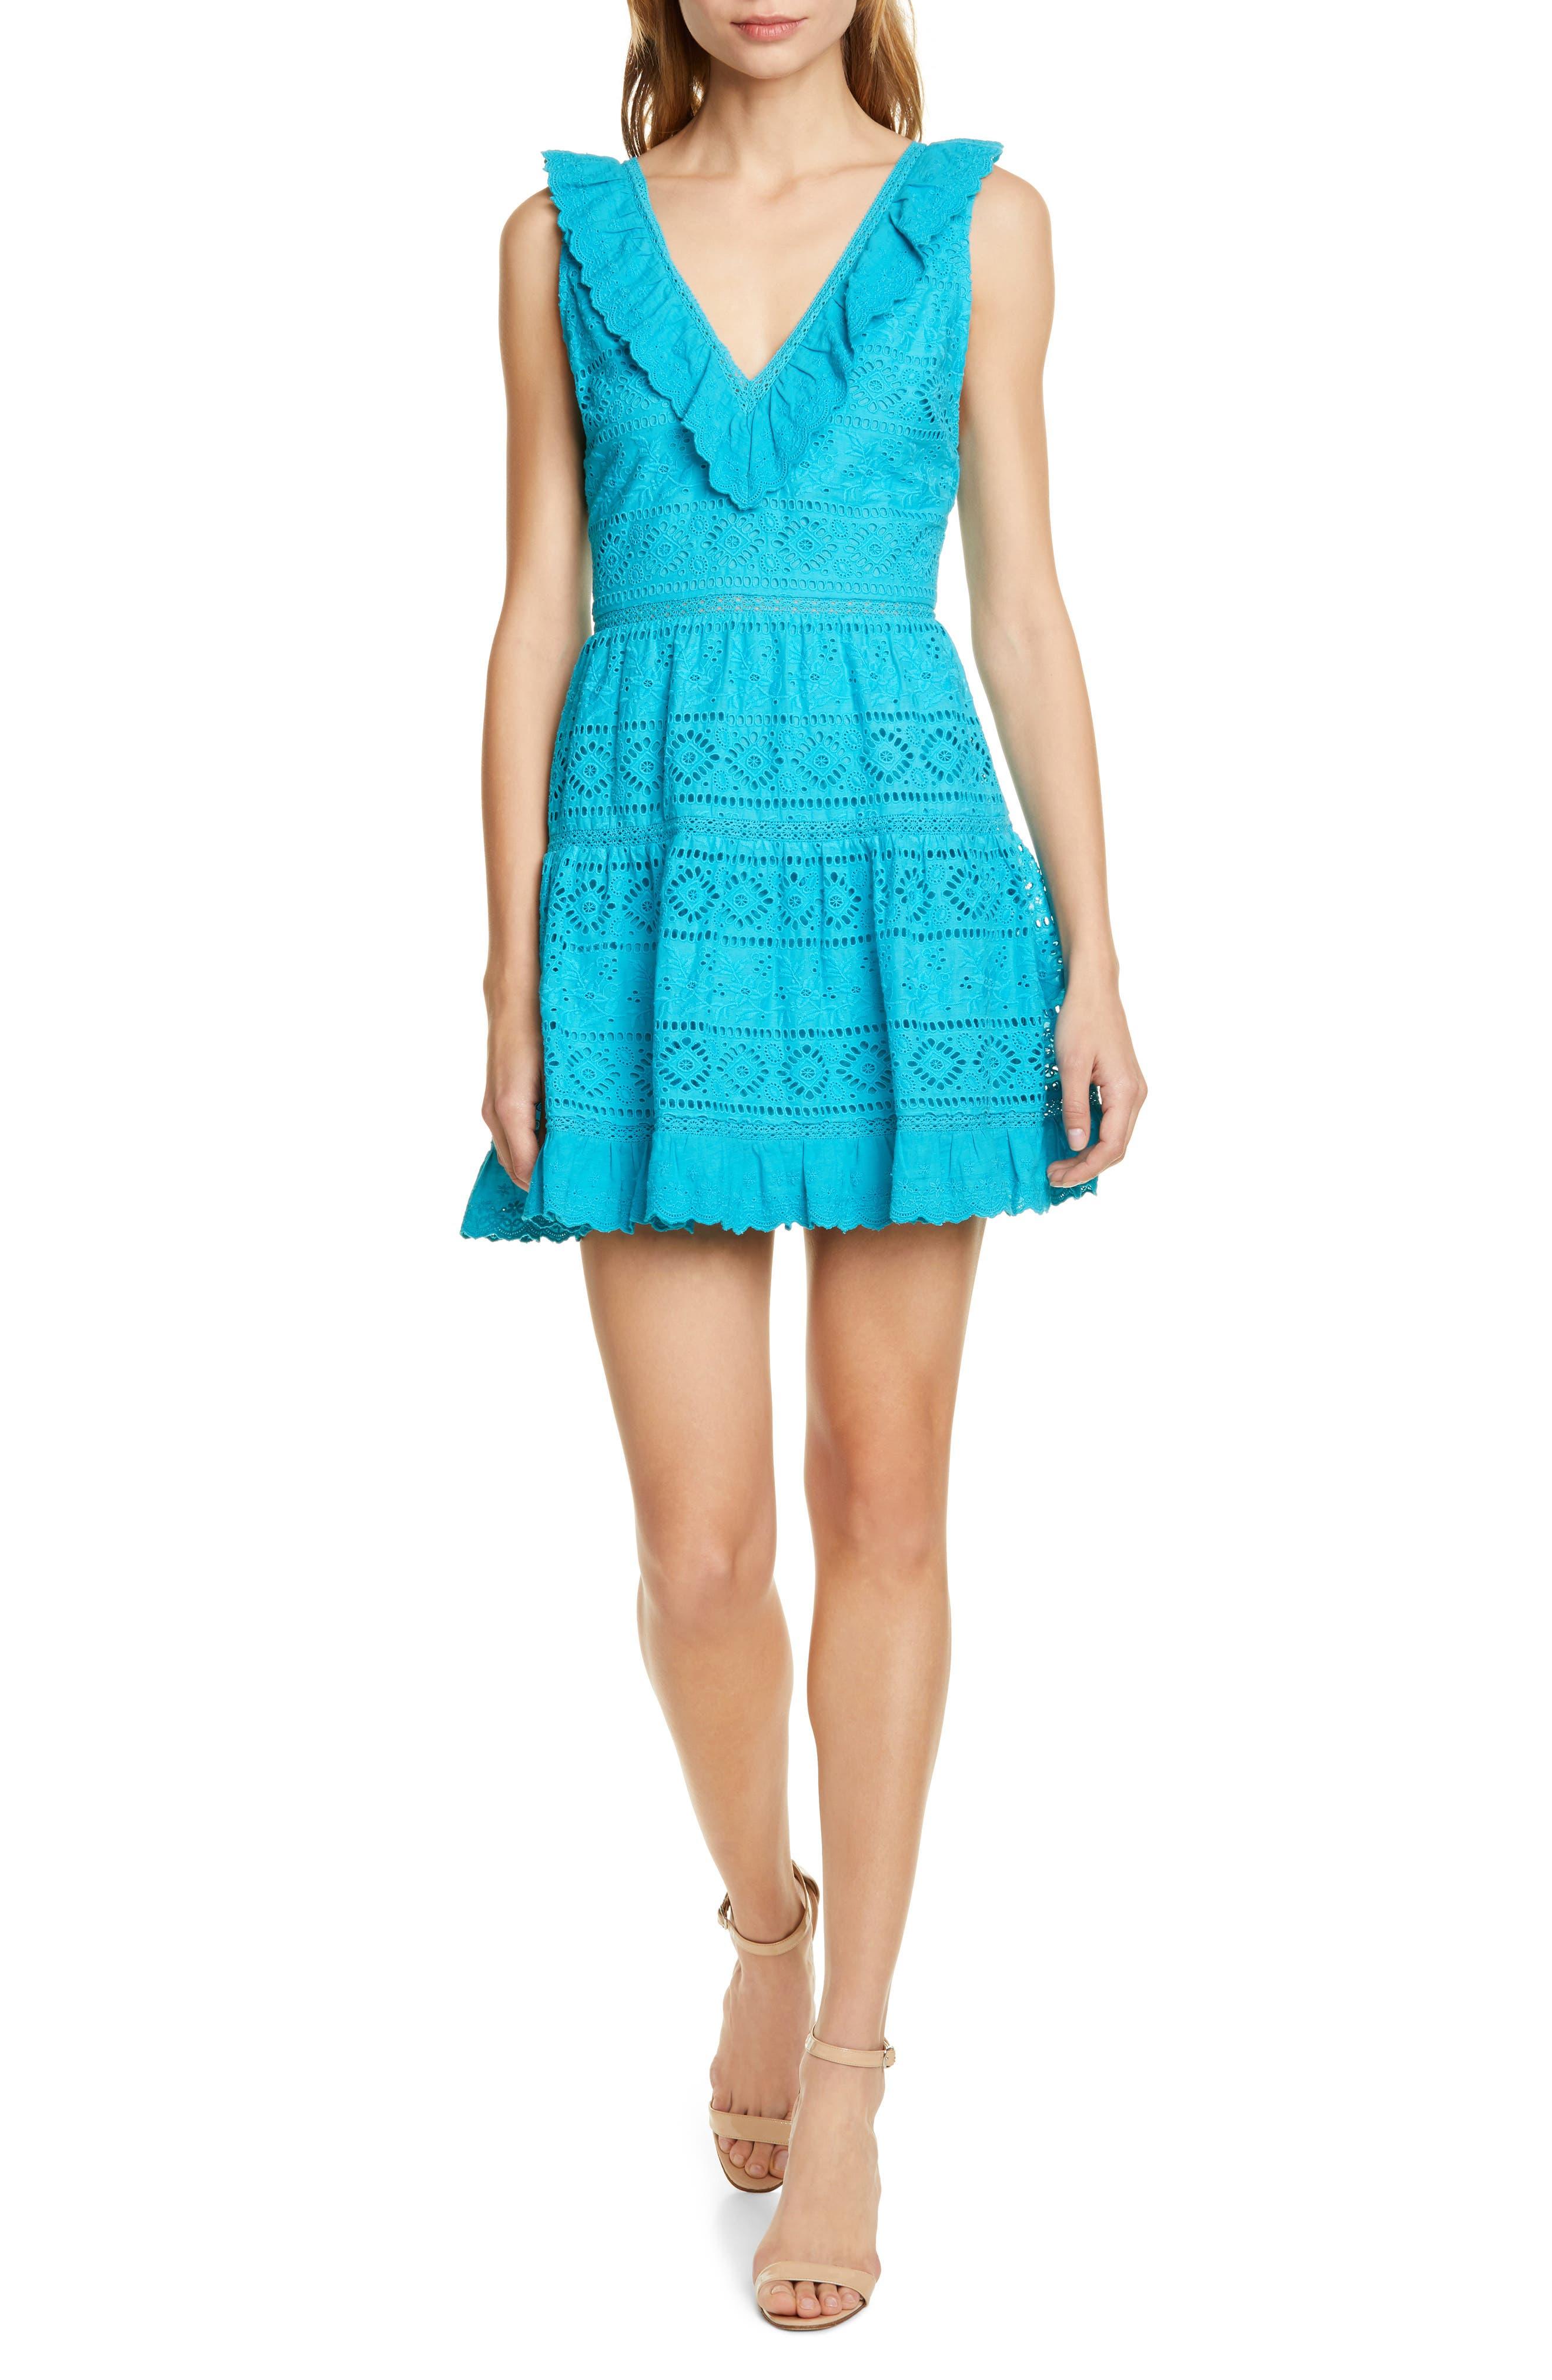 Alice + Olivia Cantara Ruffle Fit & Flare Eyelet Dress, Blue